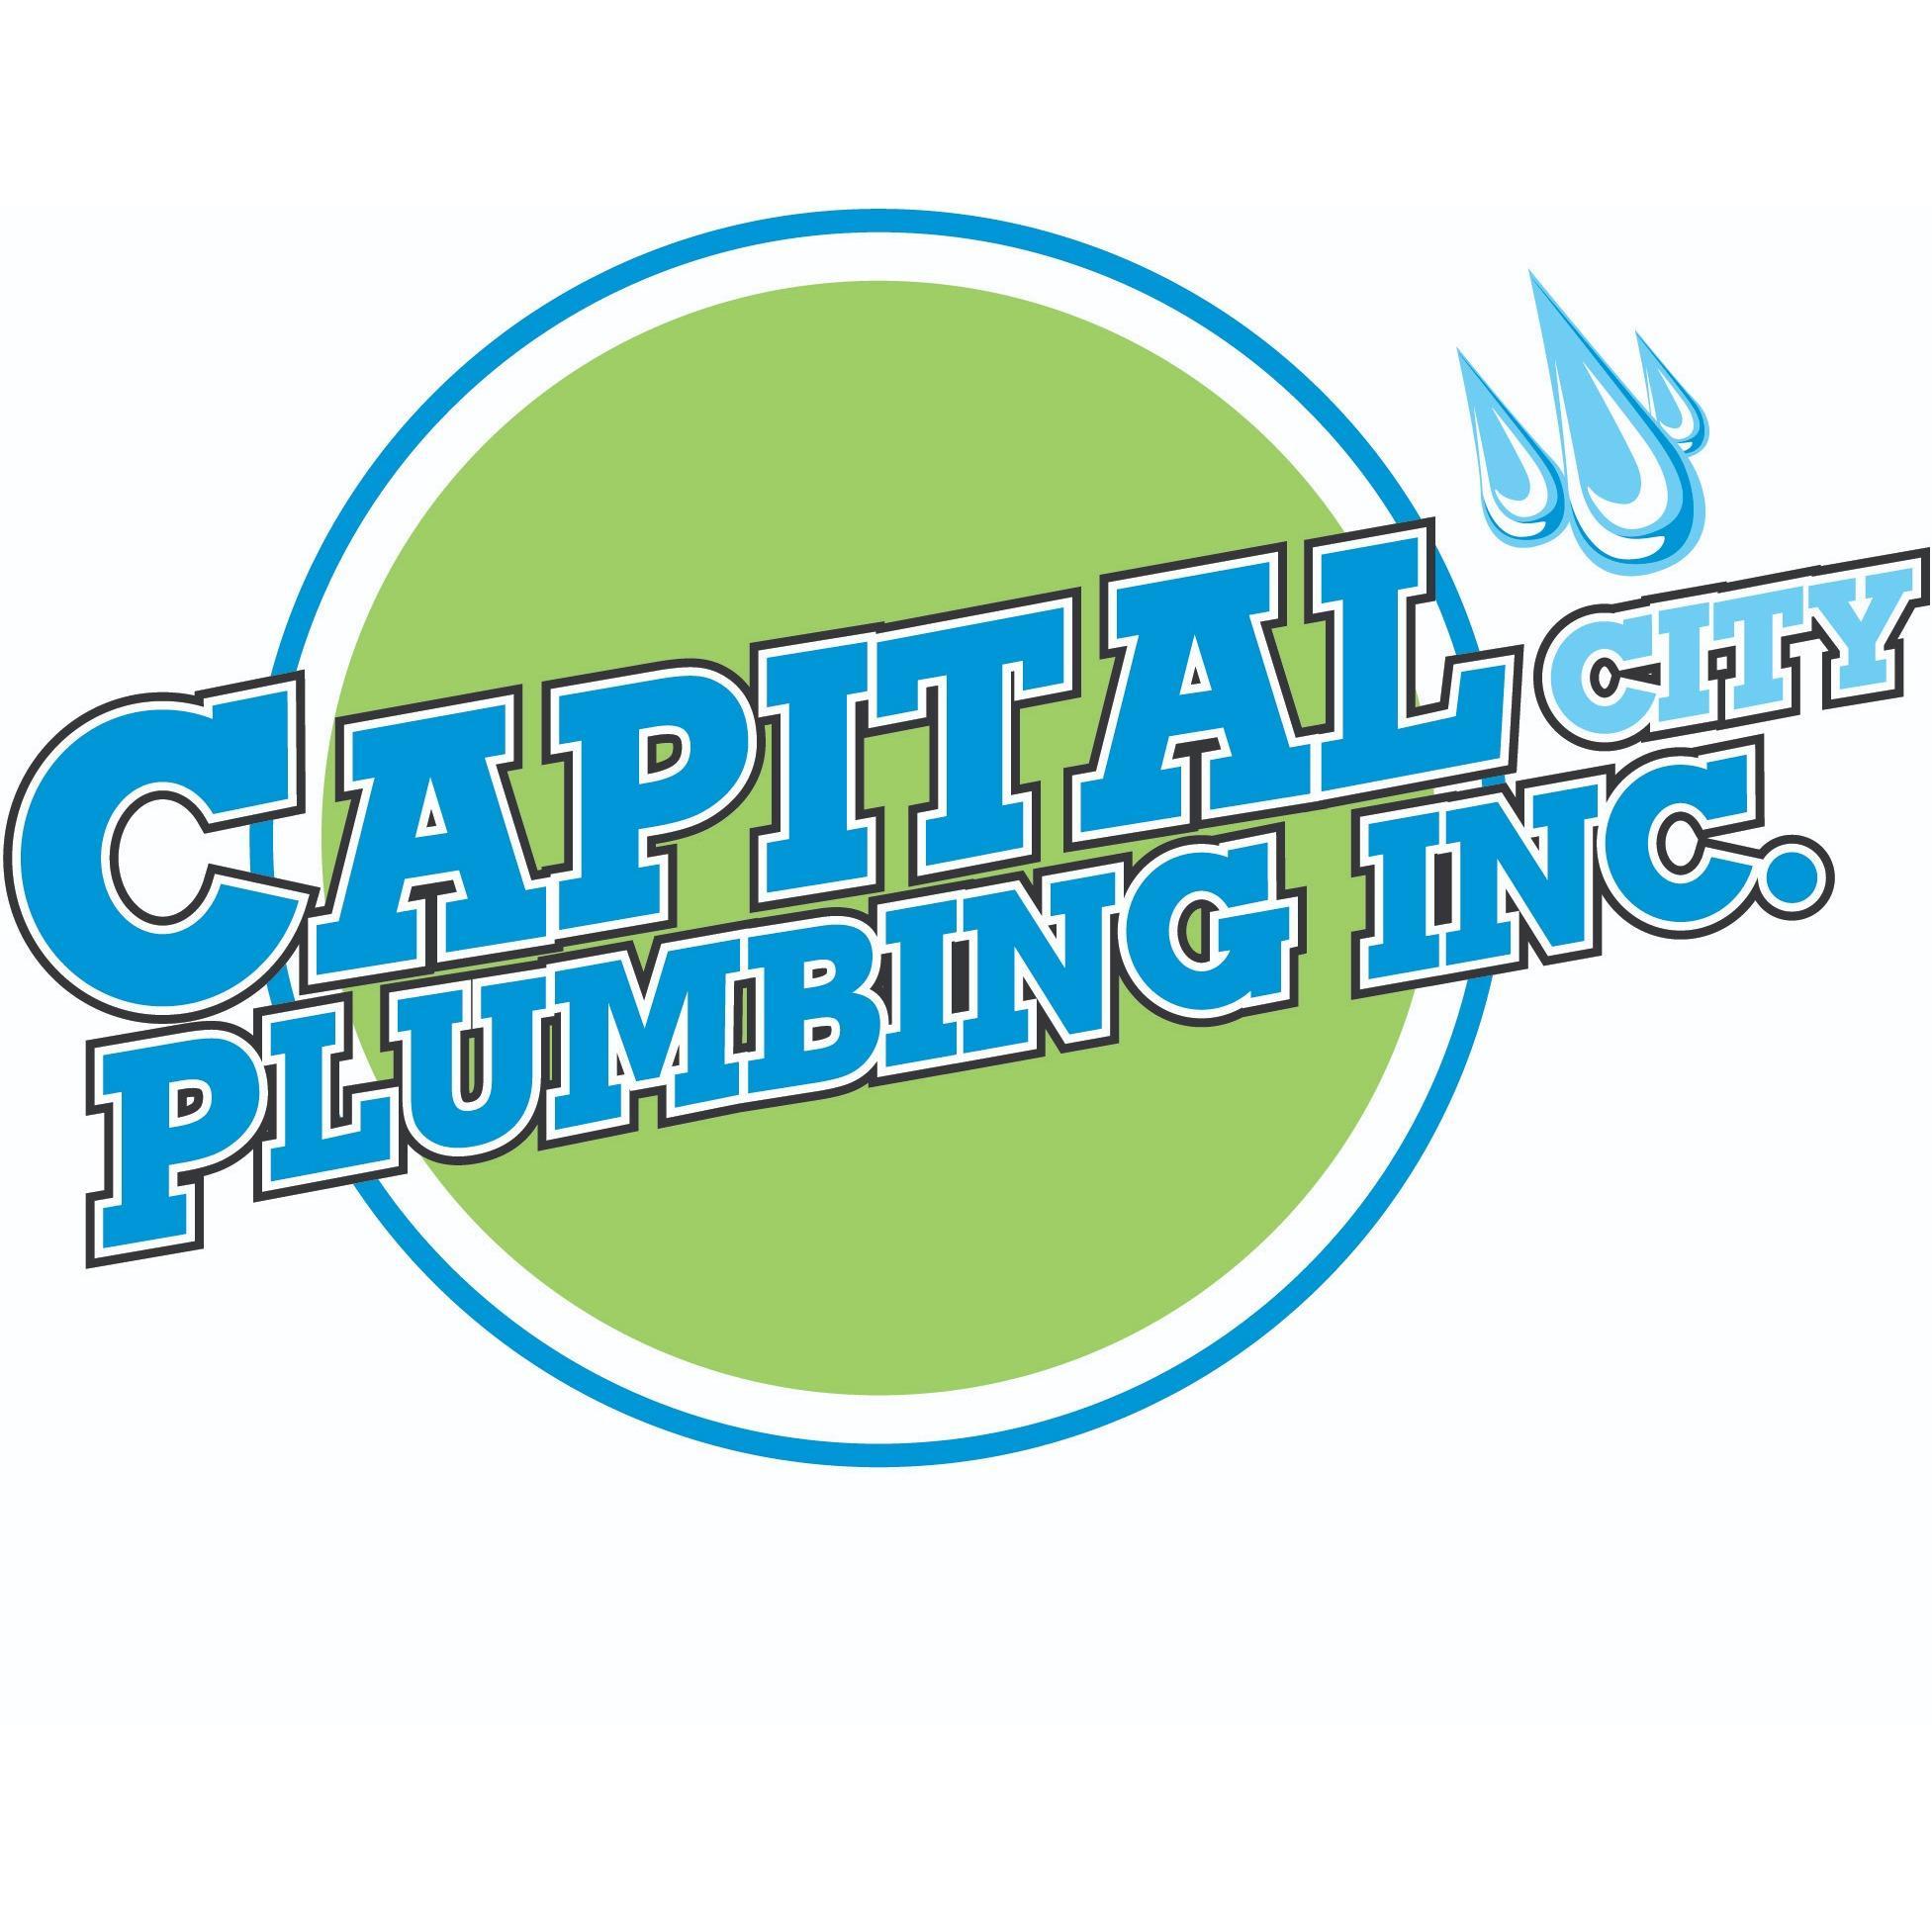 Capital City Plumbing